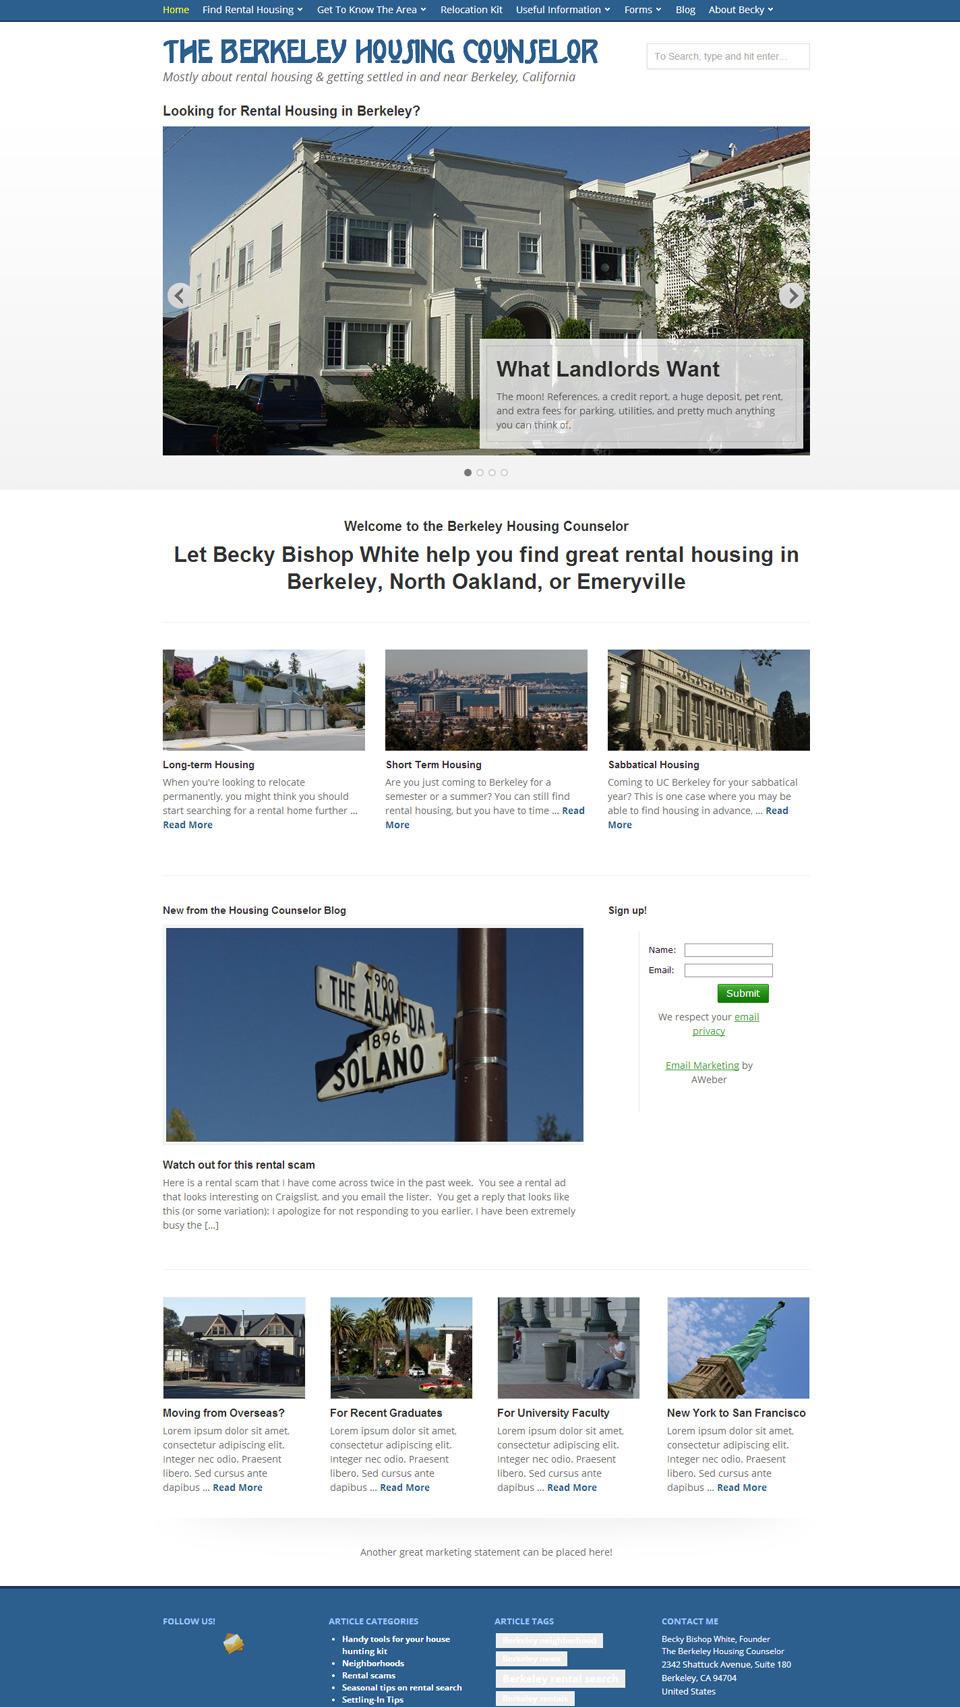 Berkeley Housing Counselor Home Page Screenshot